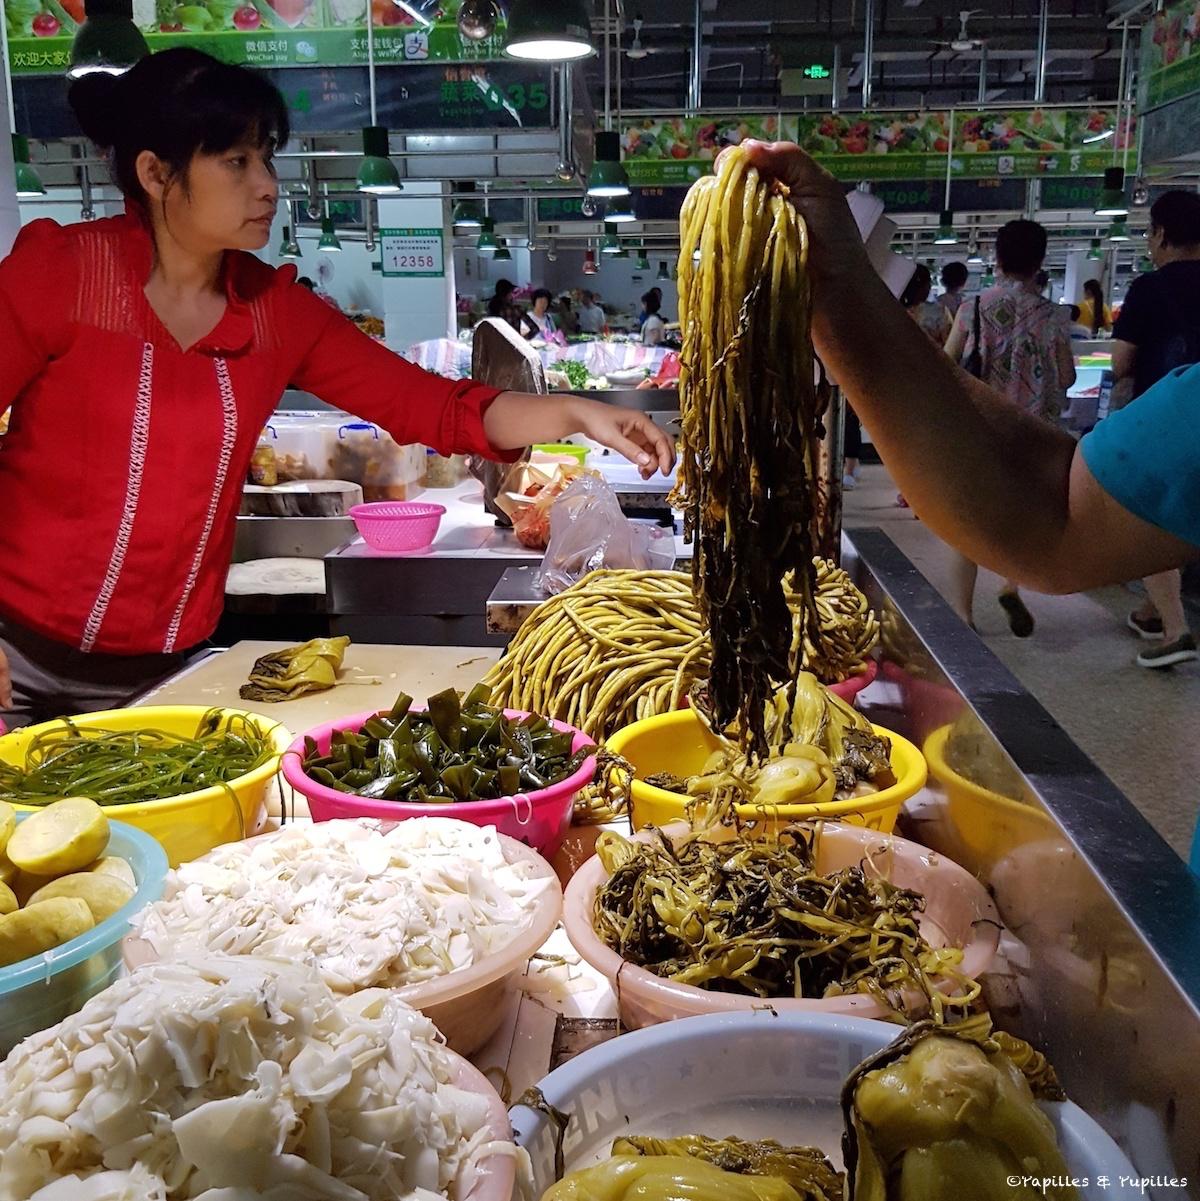 Hainan - Pickles